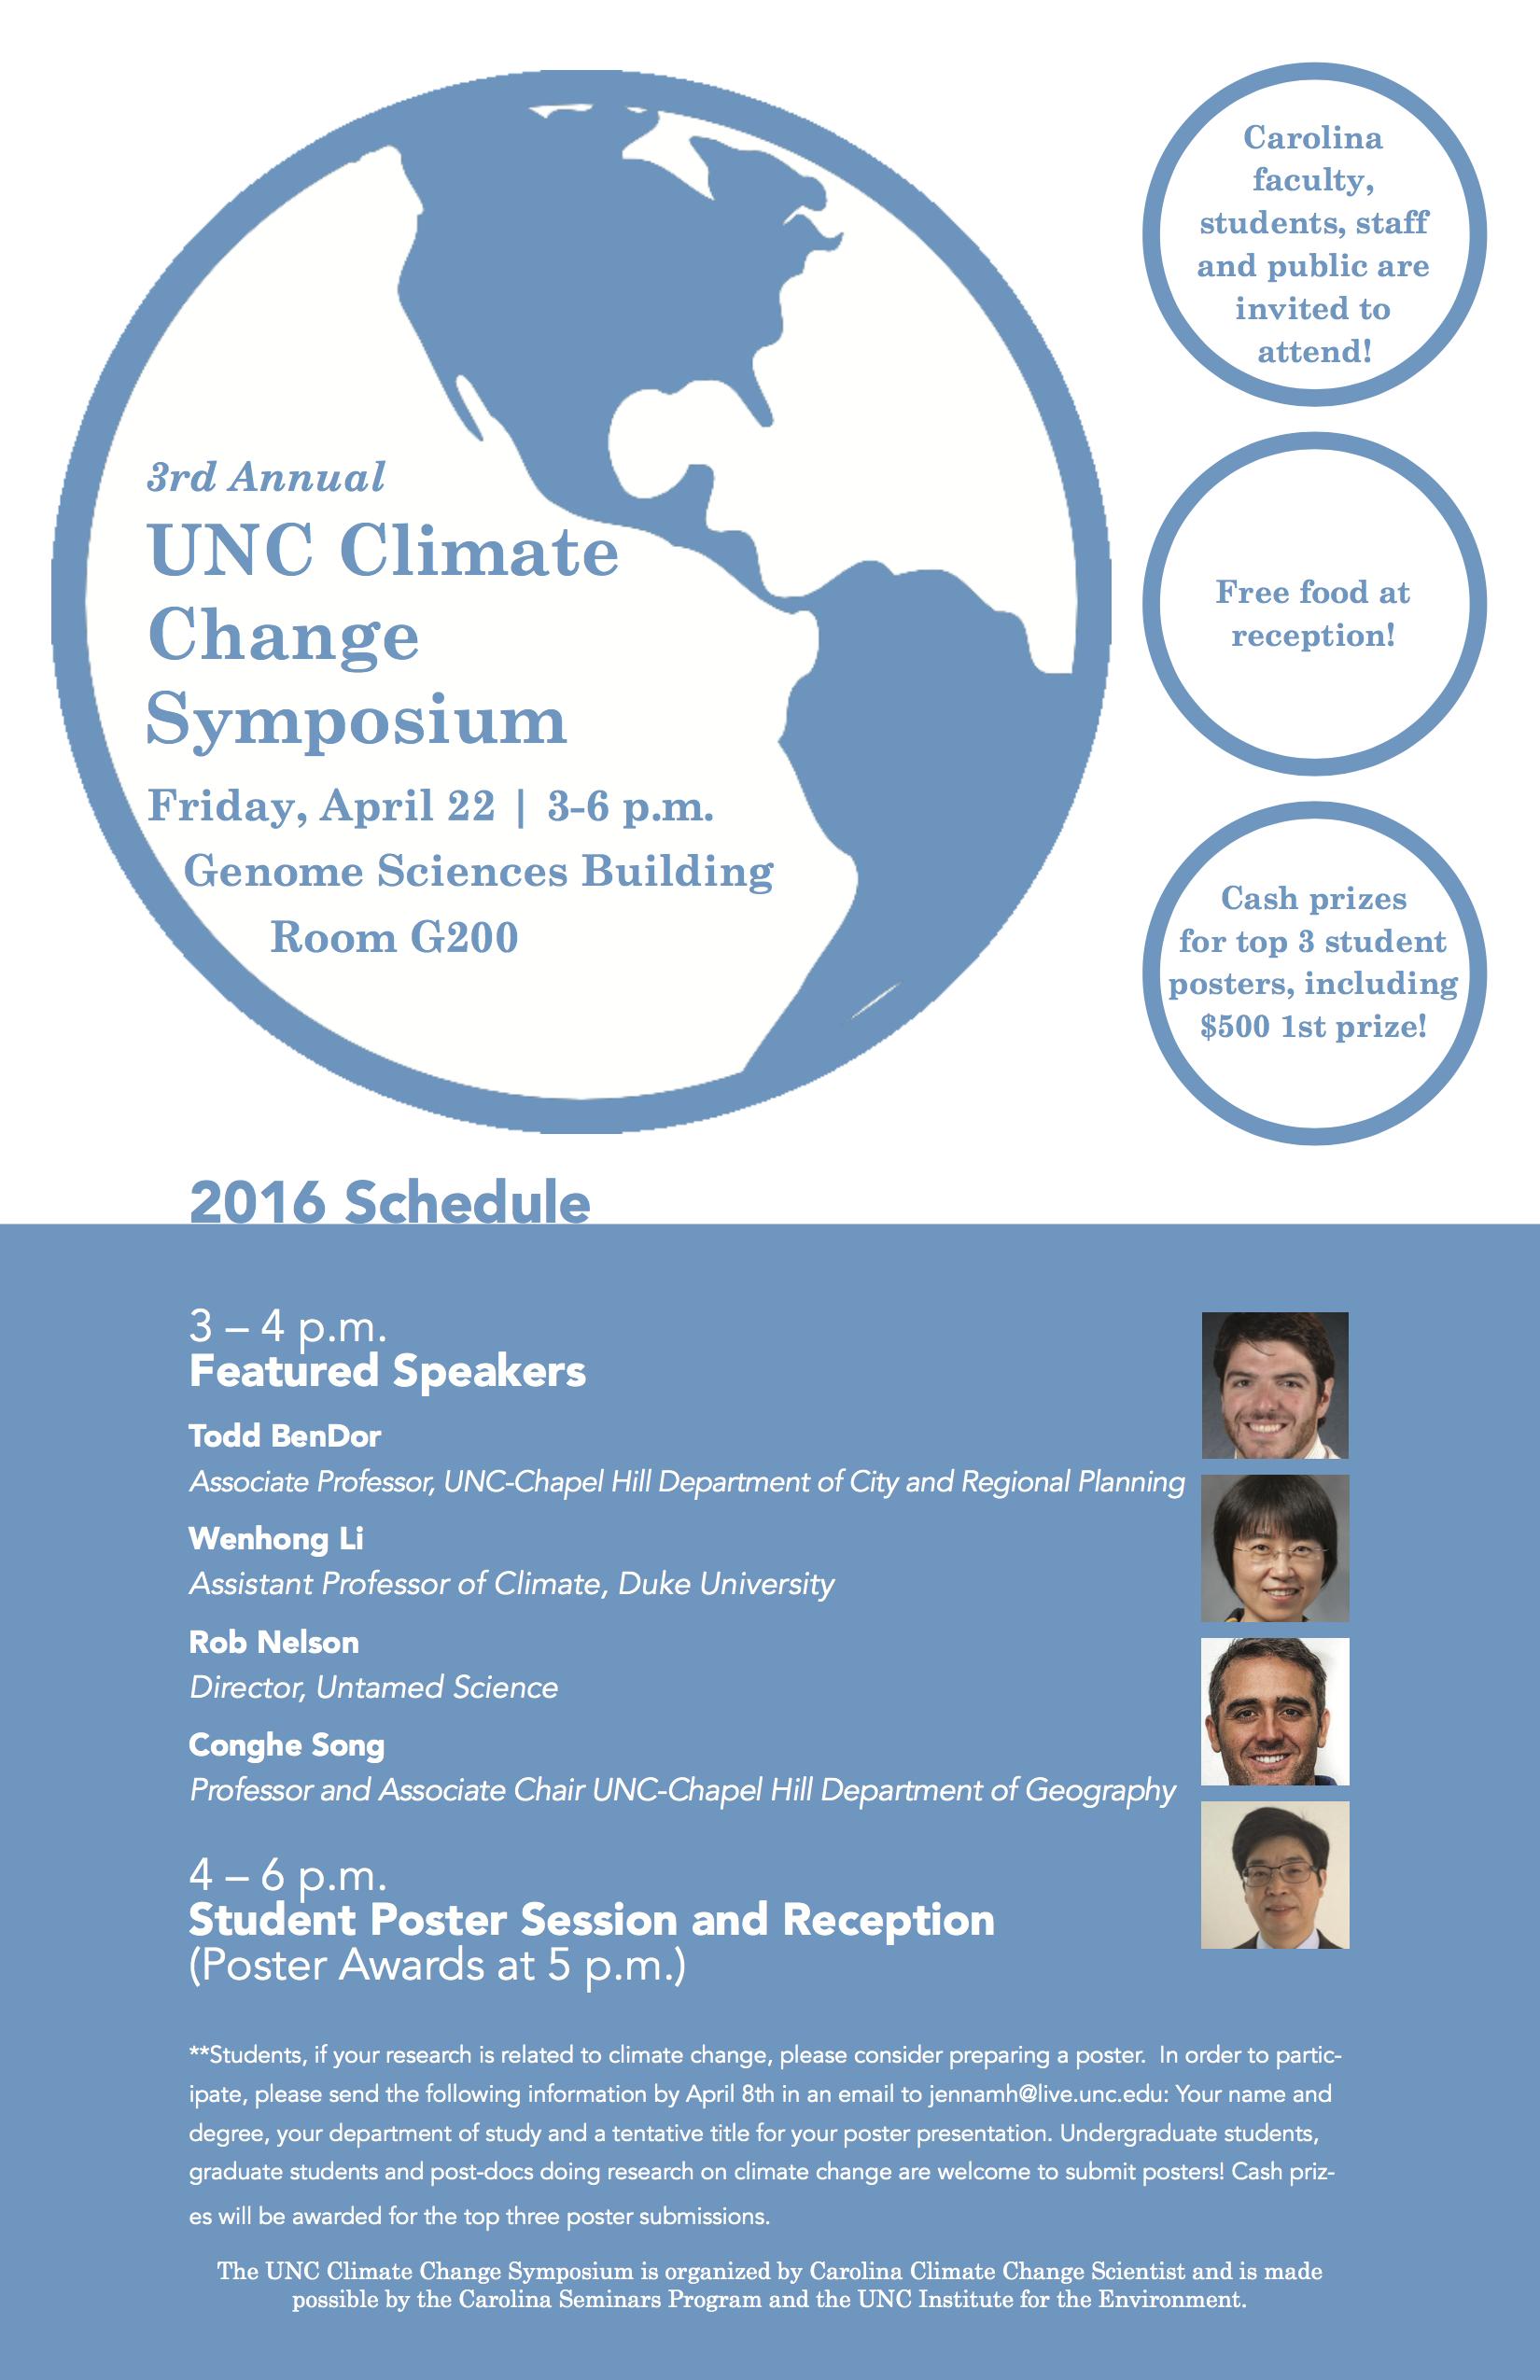 events_climate_change_symposium